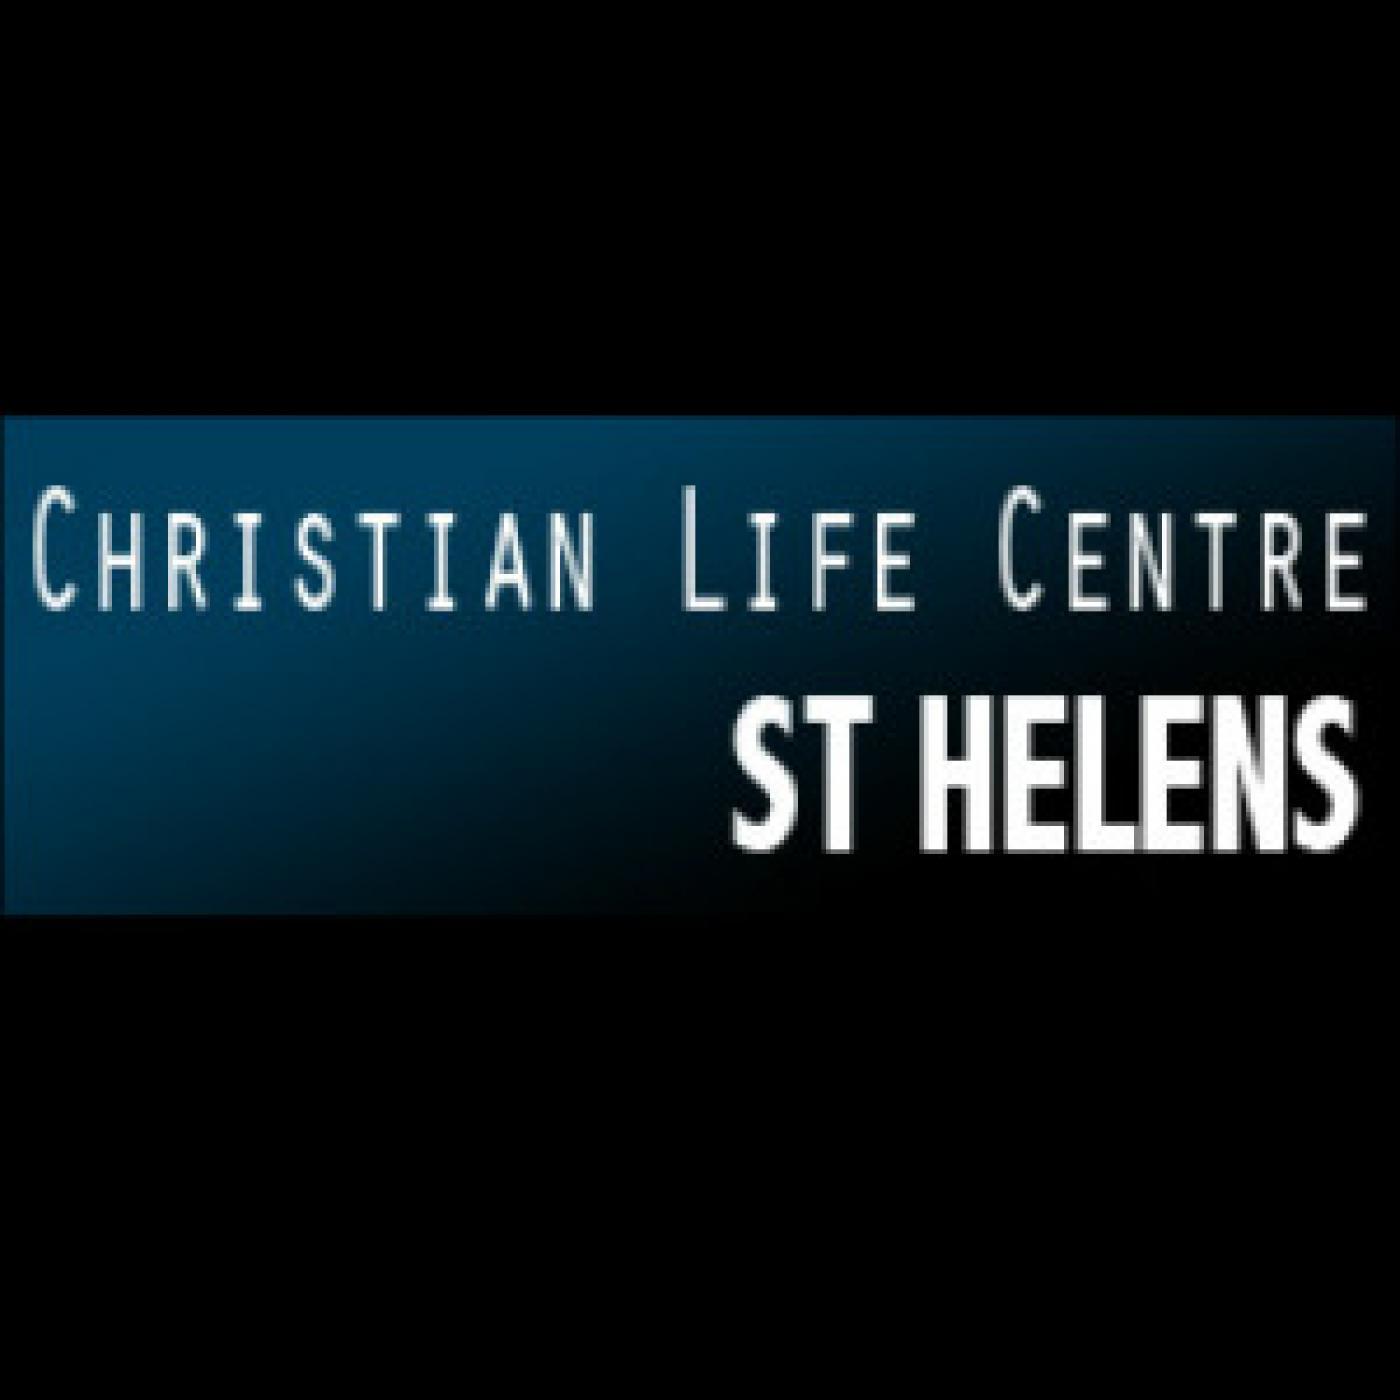 St Helens Christian Life Centre